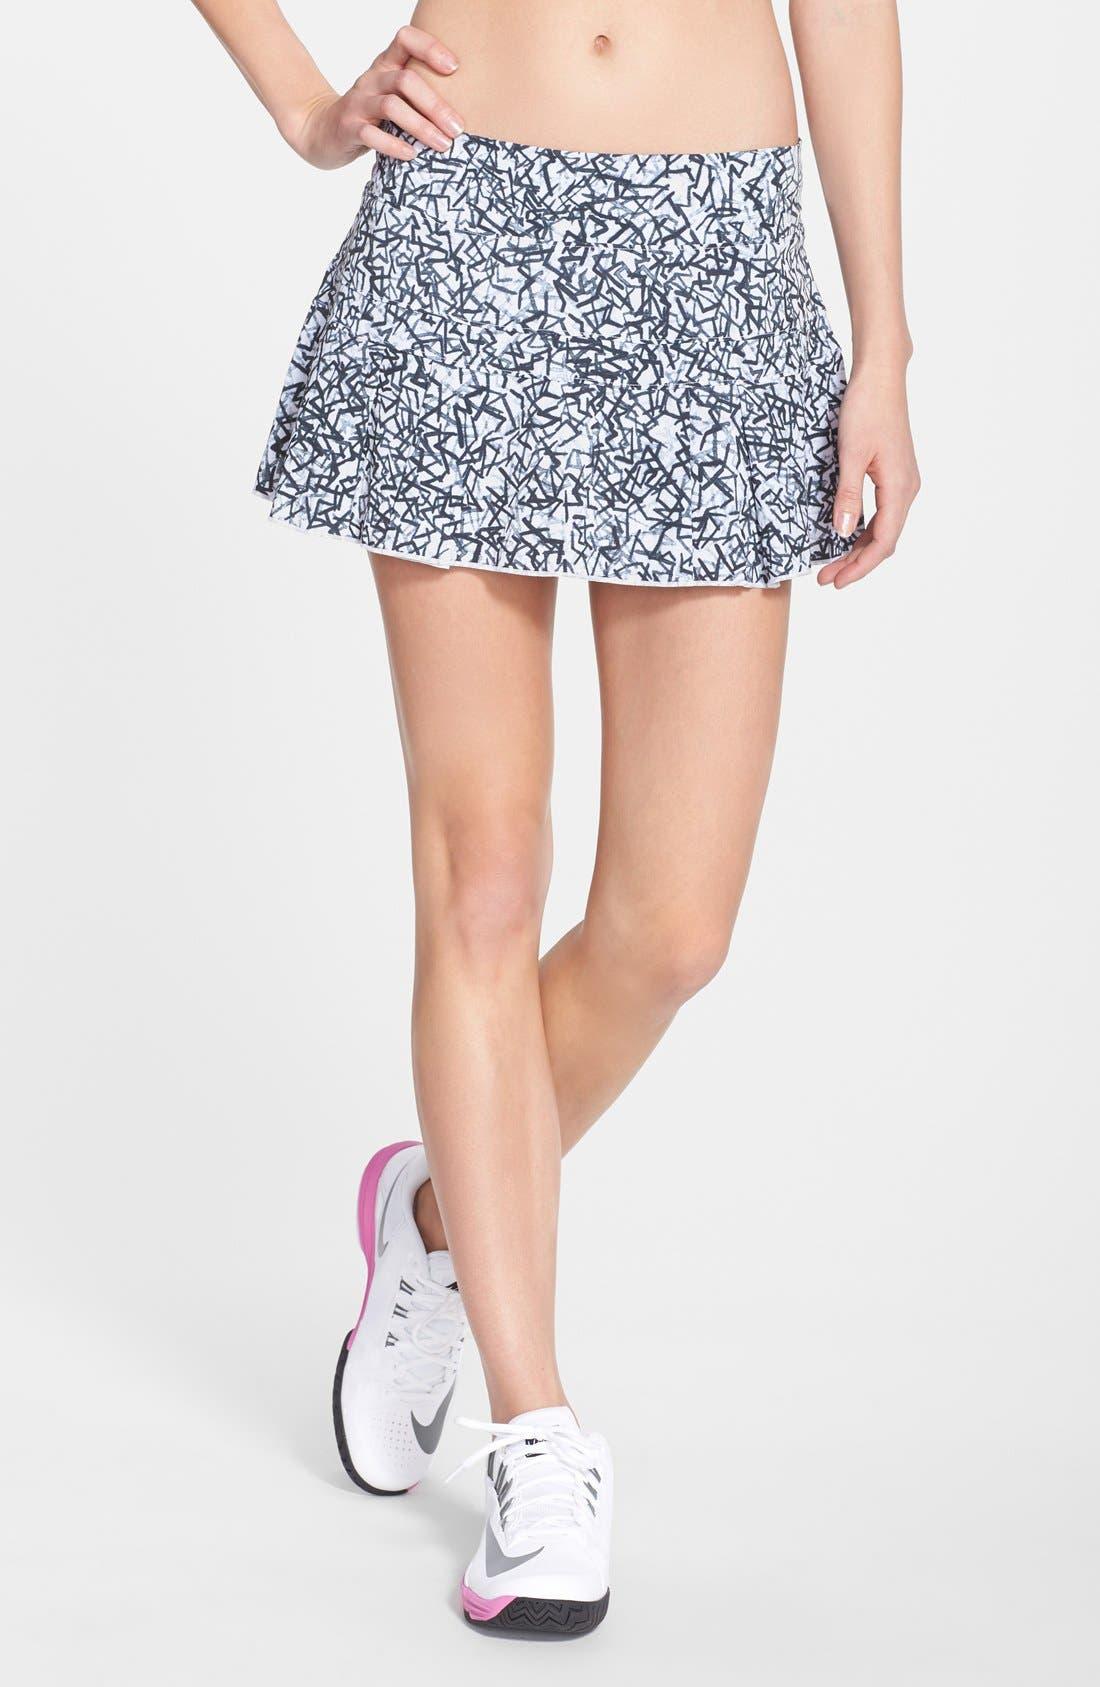 Alternate Image 1 Selected - Nike 'Victory' Print Tennis Skirt